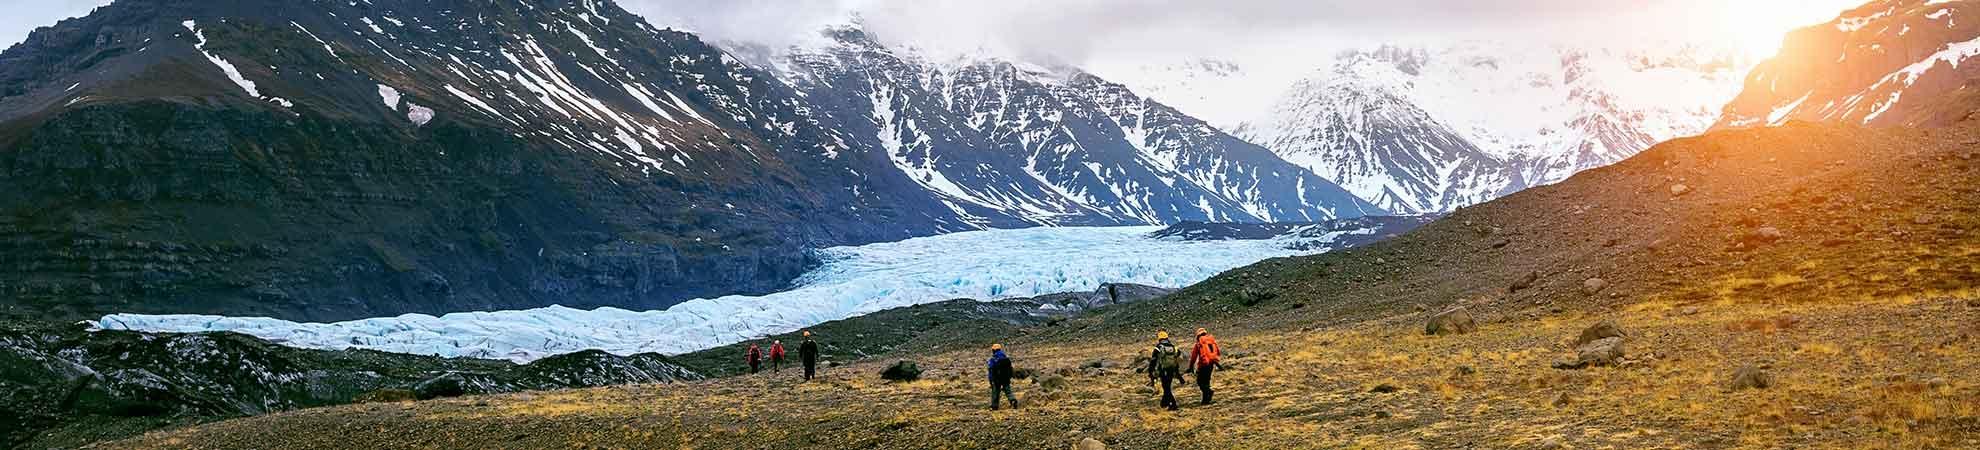 Voyage Parc national de Skaftafell